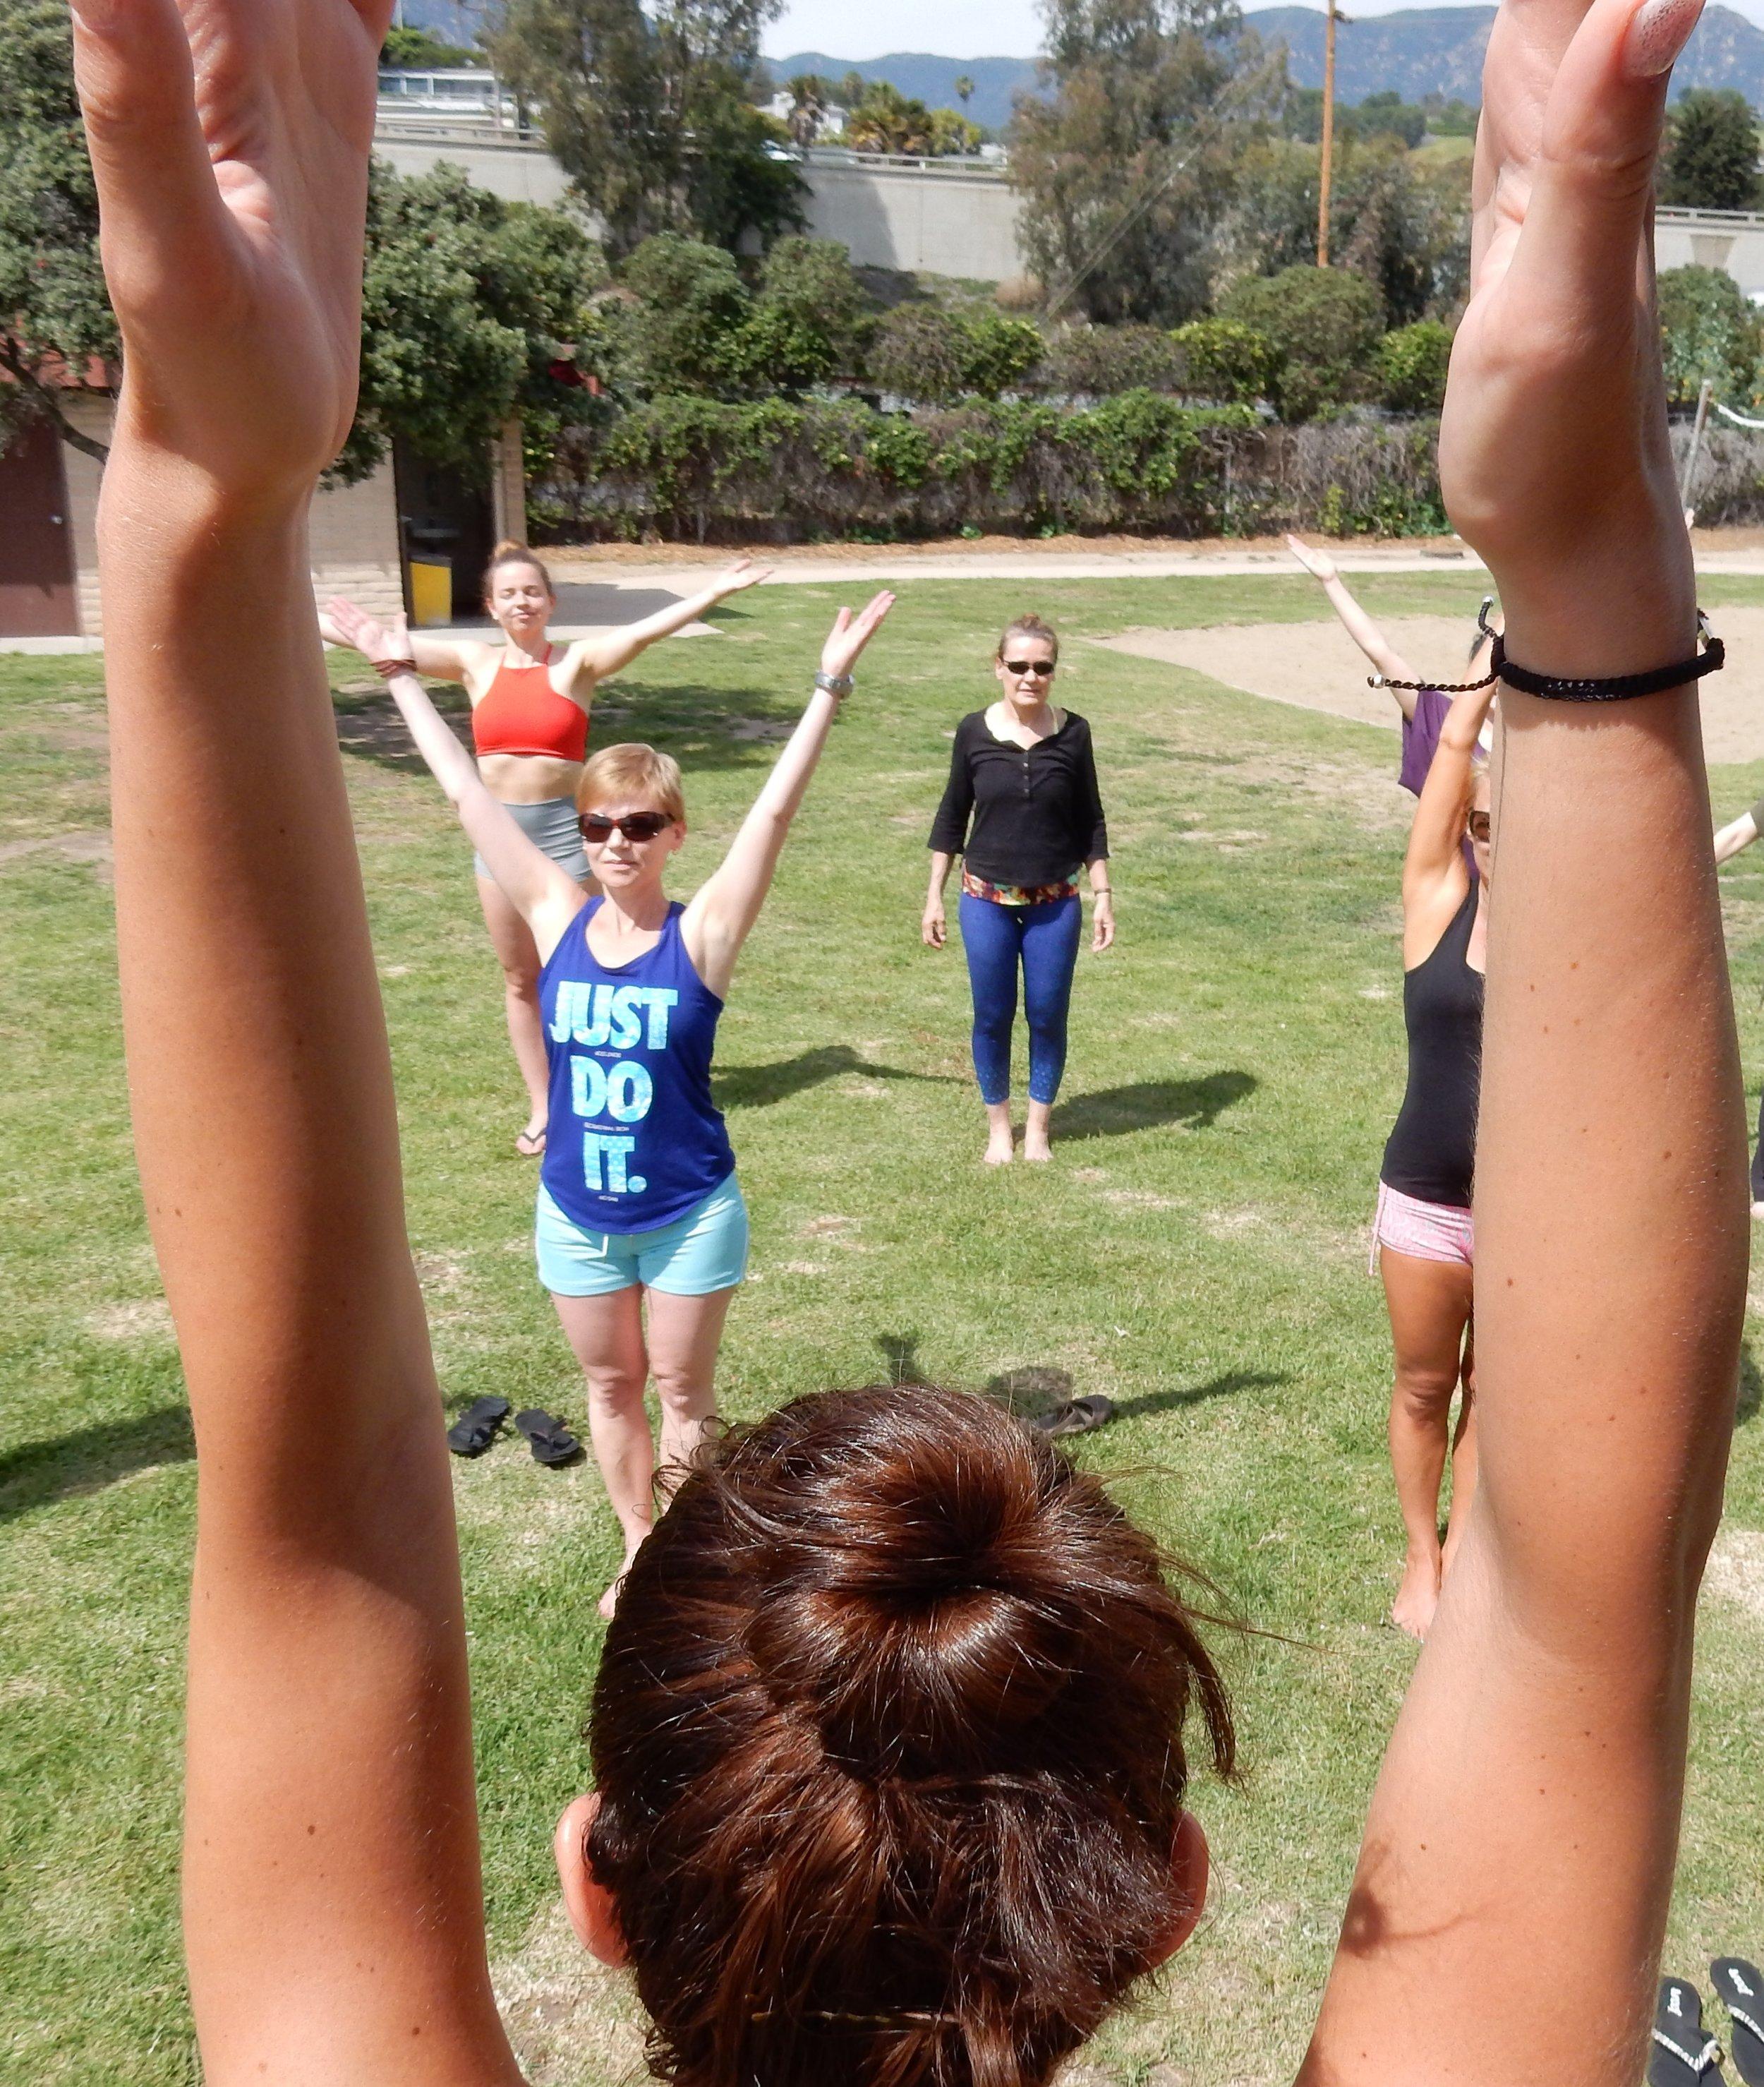 flow-yoga-teacher-training-santa-barbara-apply-now.JPG